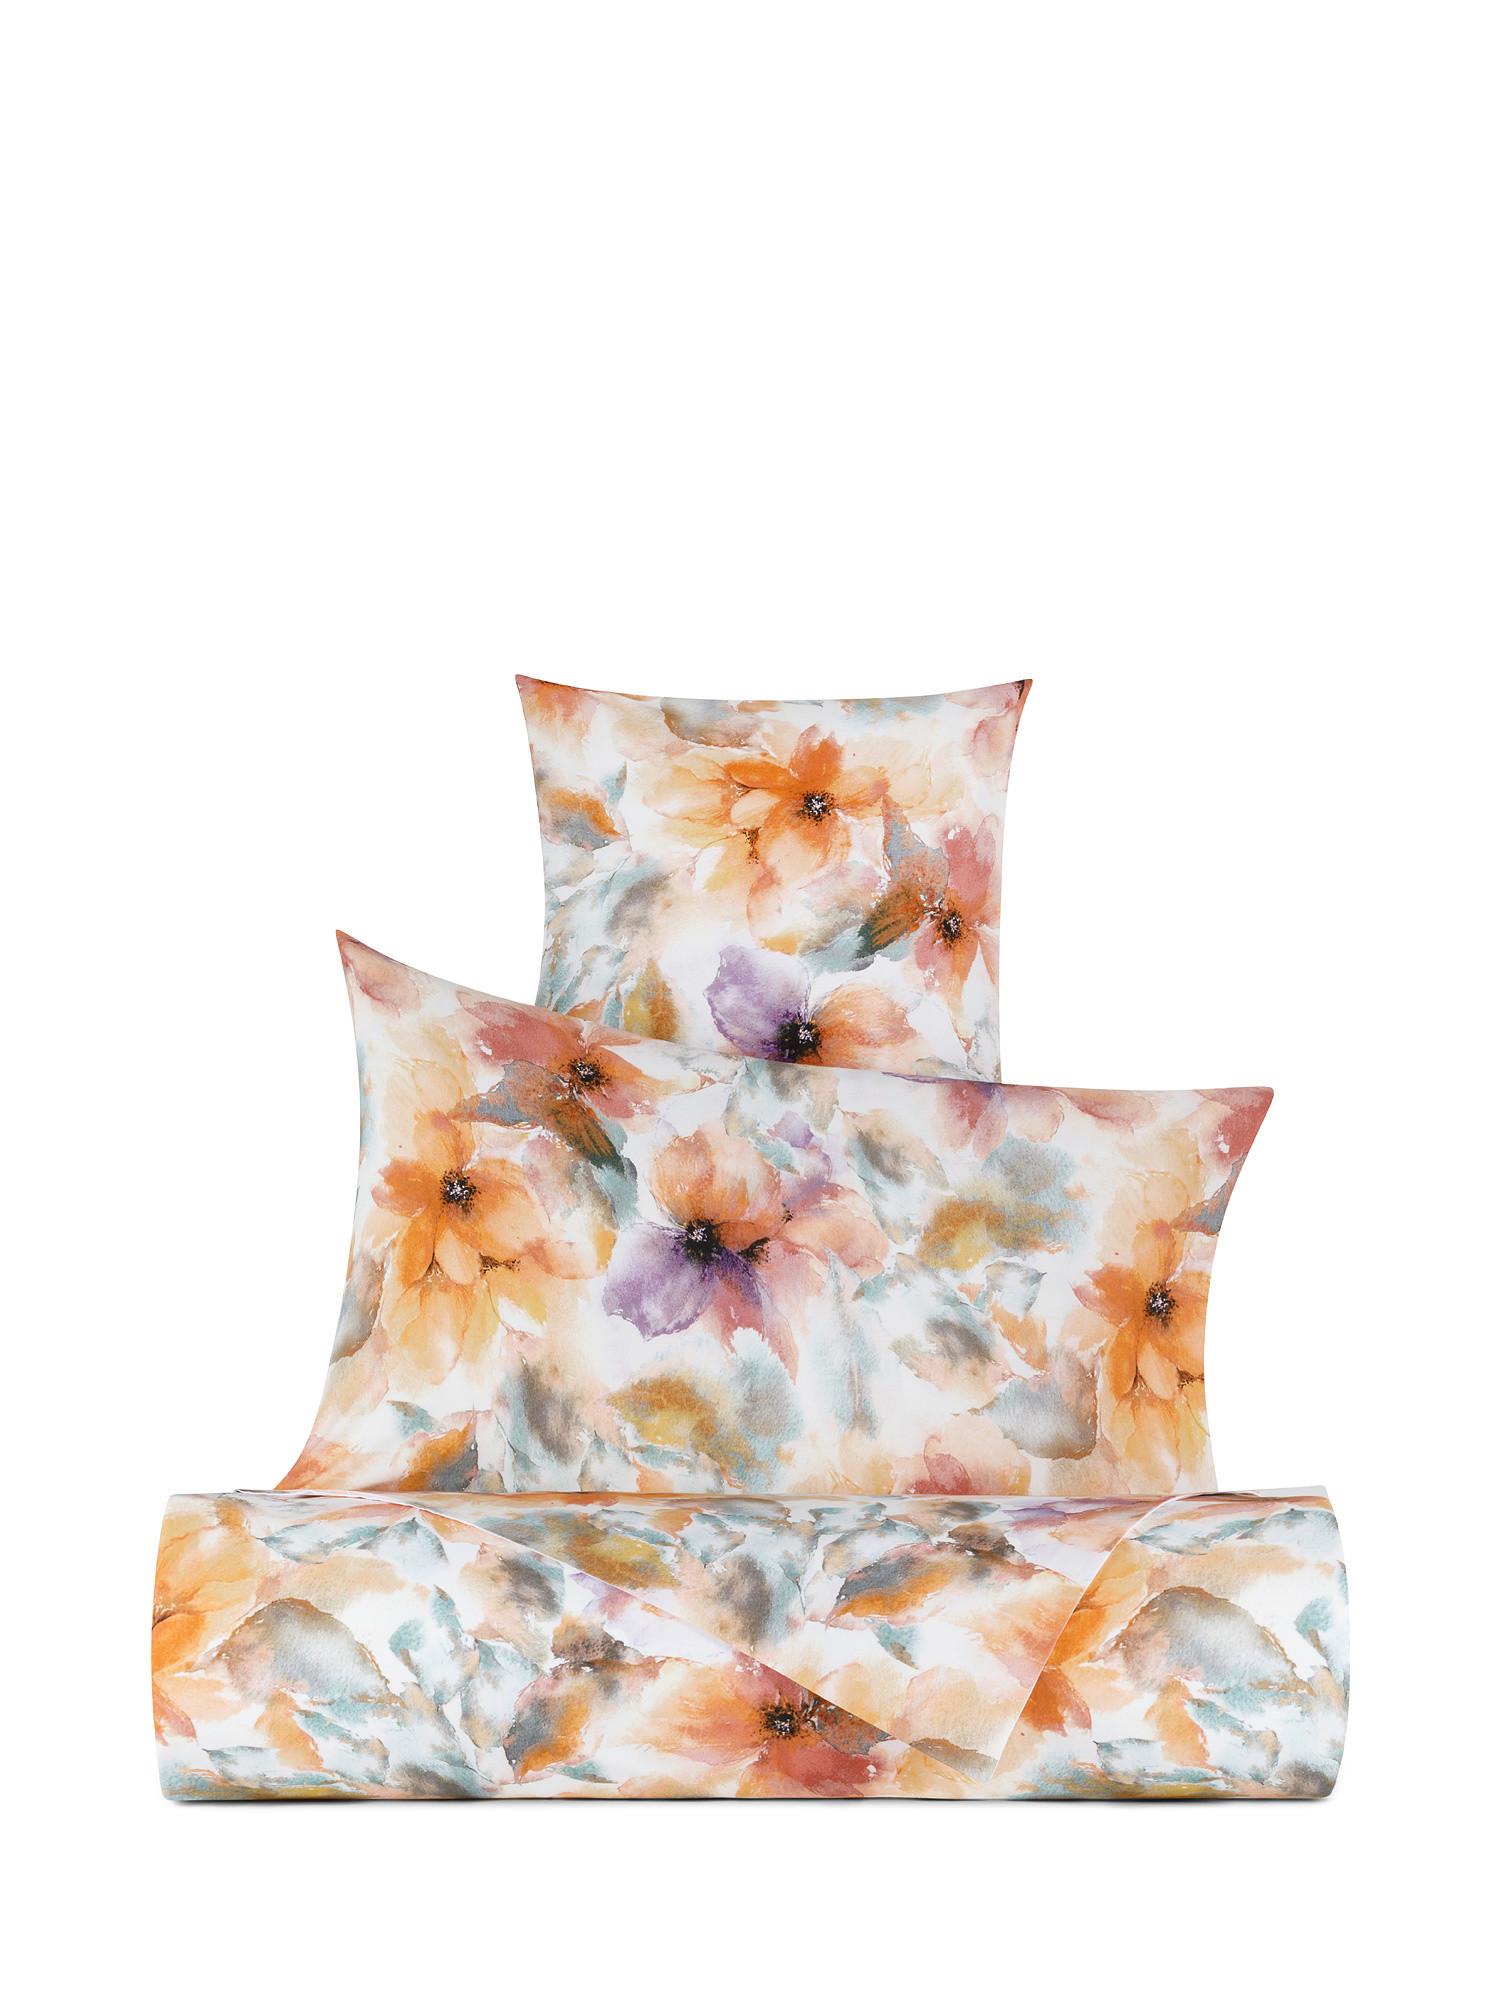 Lenzuolo liscio cotone percalle fantasia autunnale, Multicolor, large image number 0